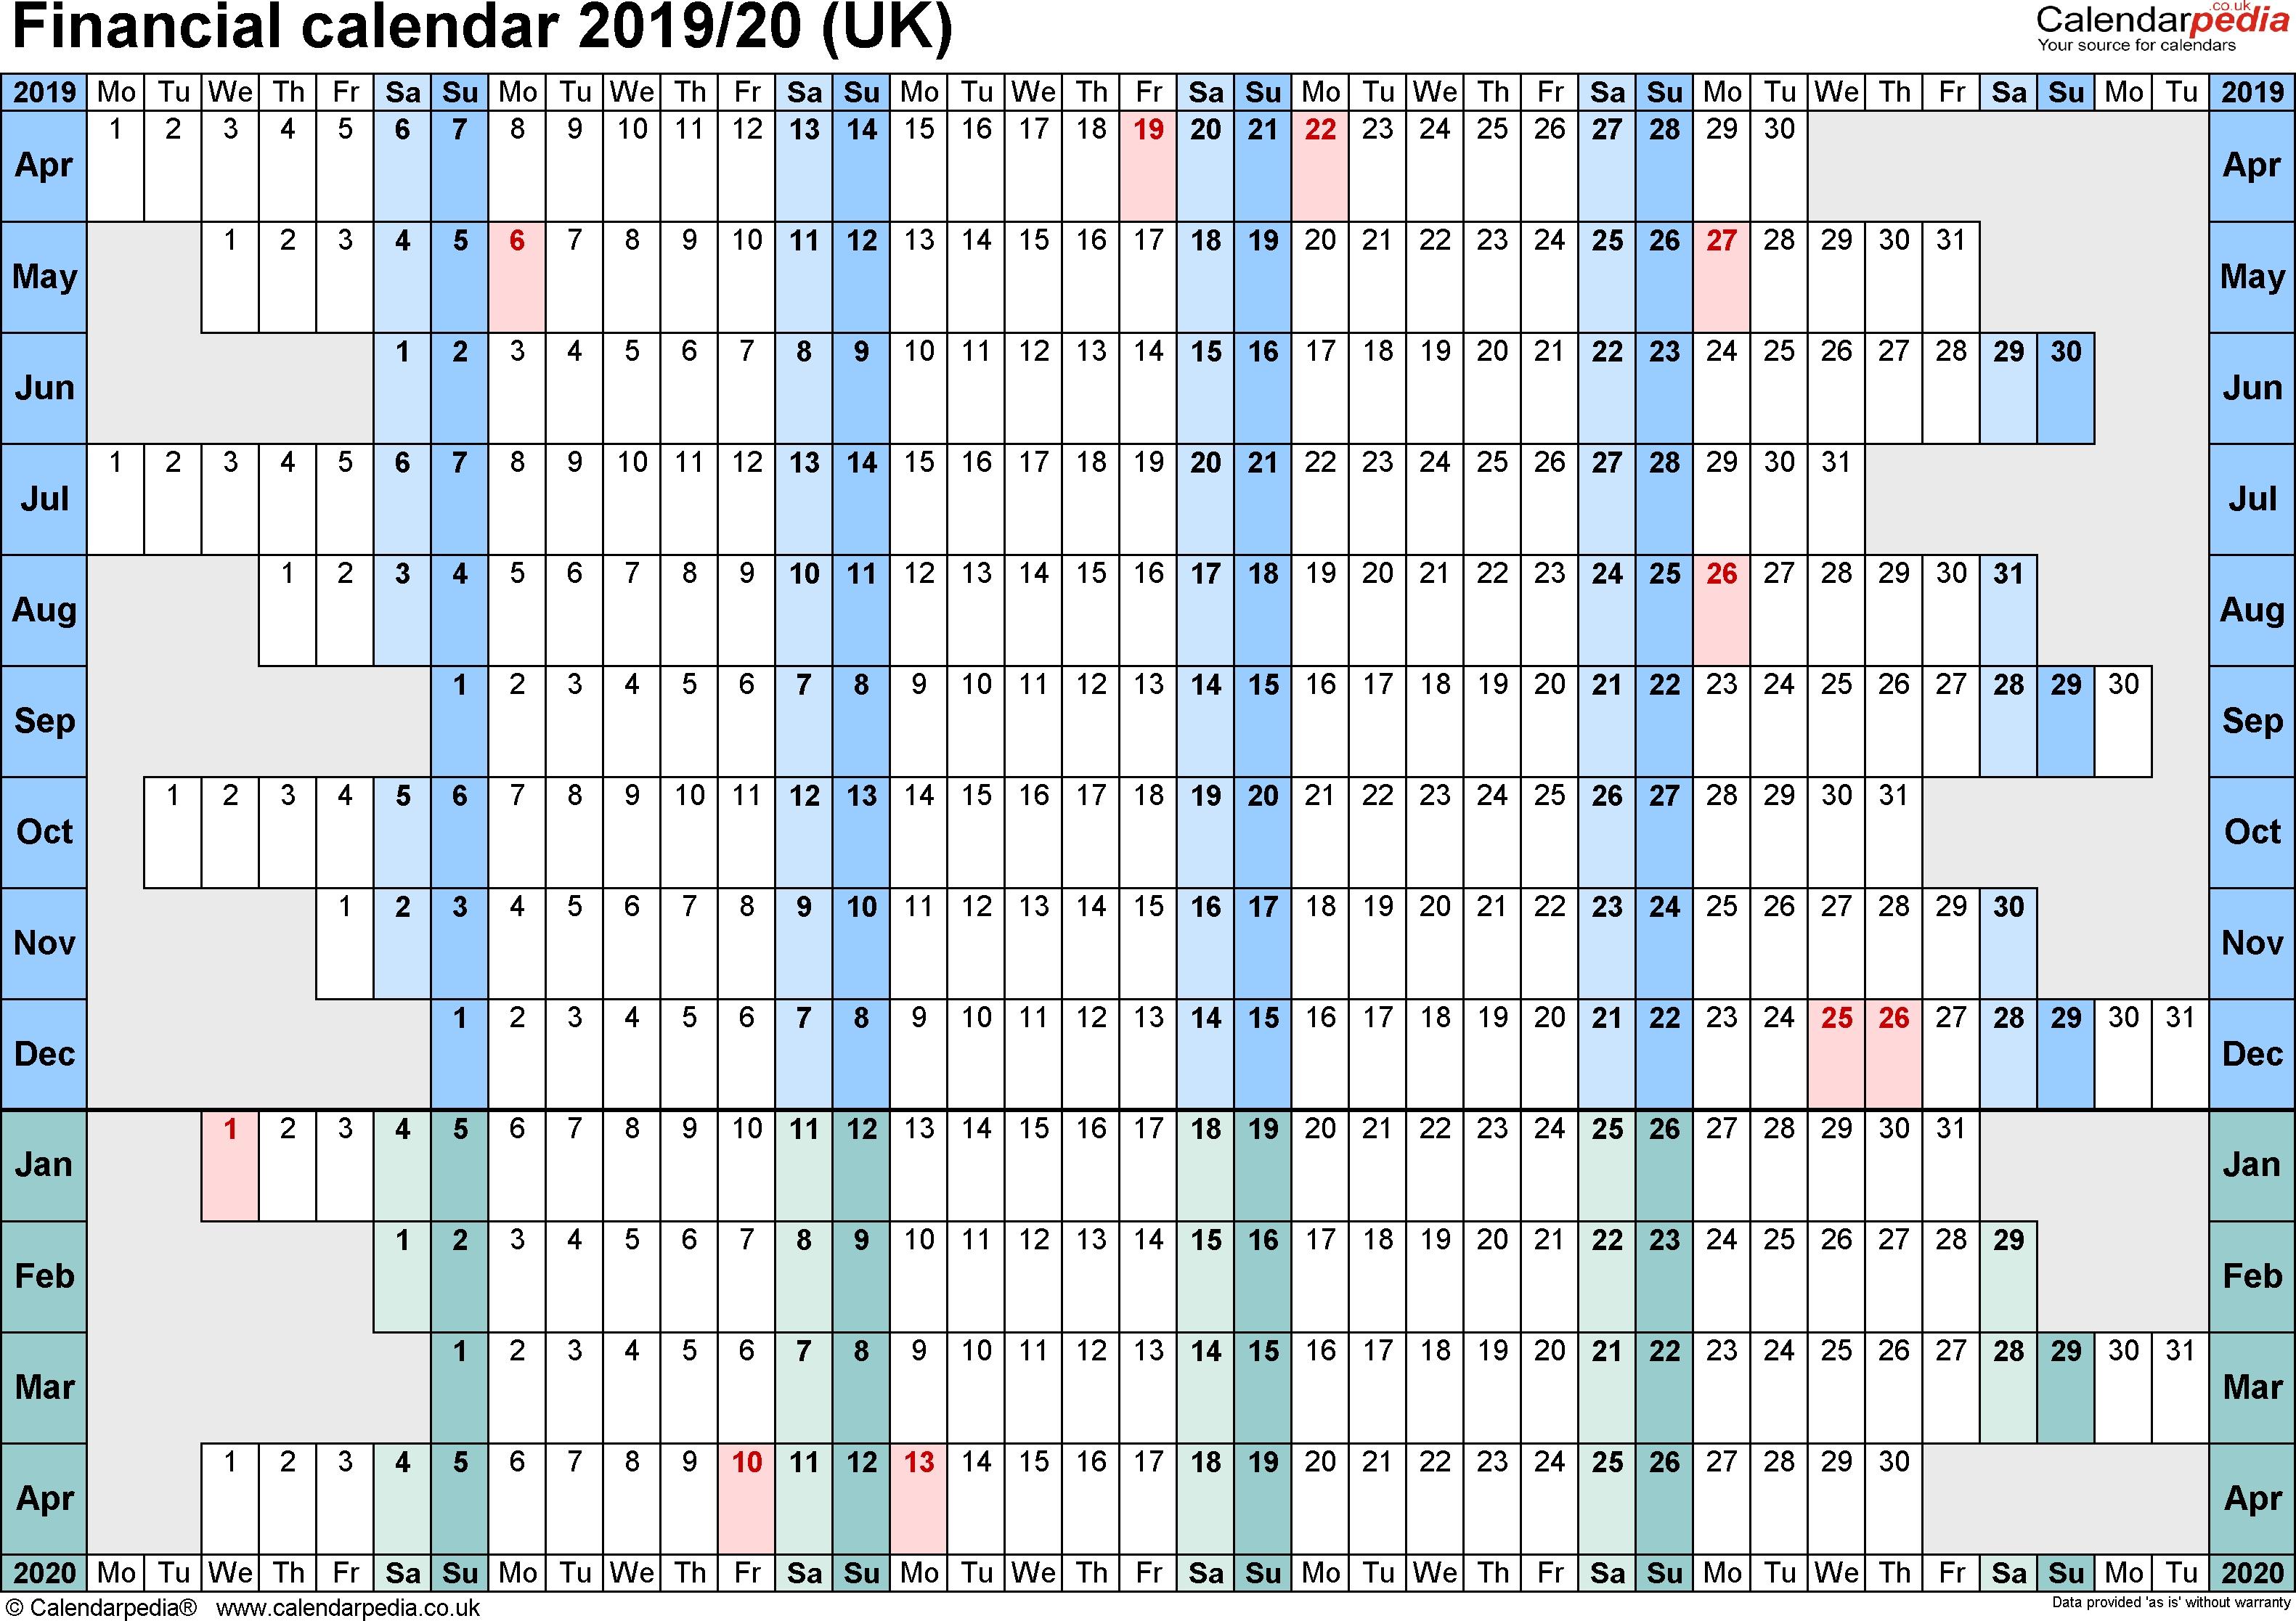 Financial Calendars 2019/20 (Uk) In Pdf Format 4 Week Period Calendar 2019